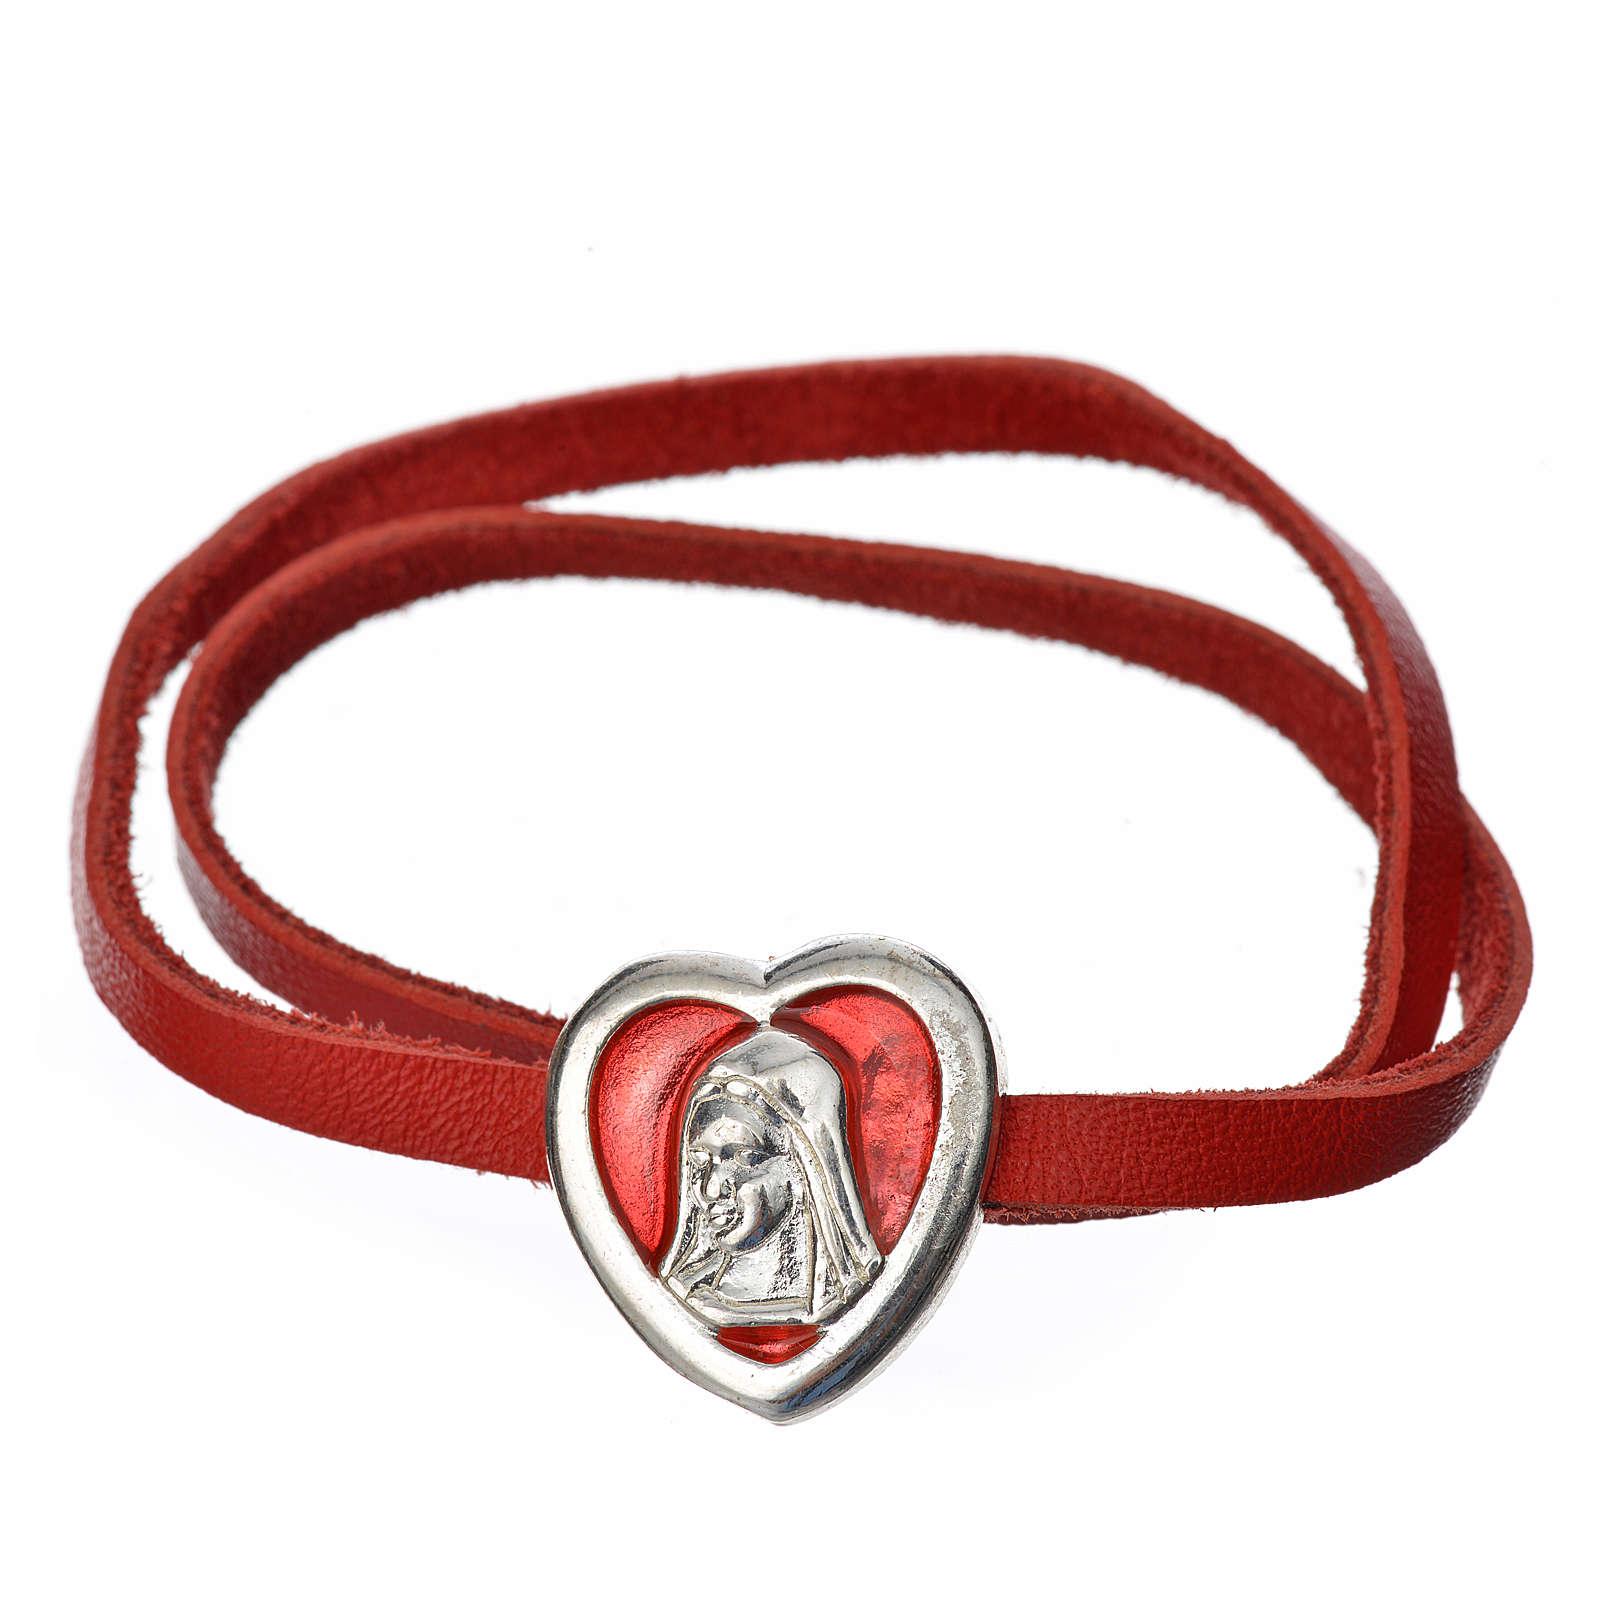 Girocollo pelle rossa placca Madonna 4